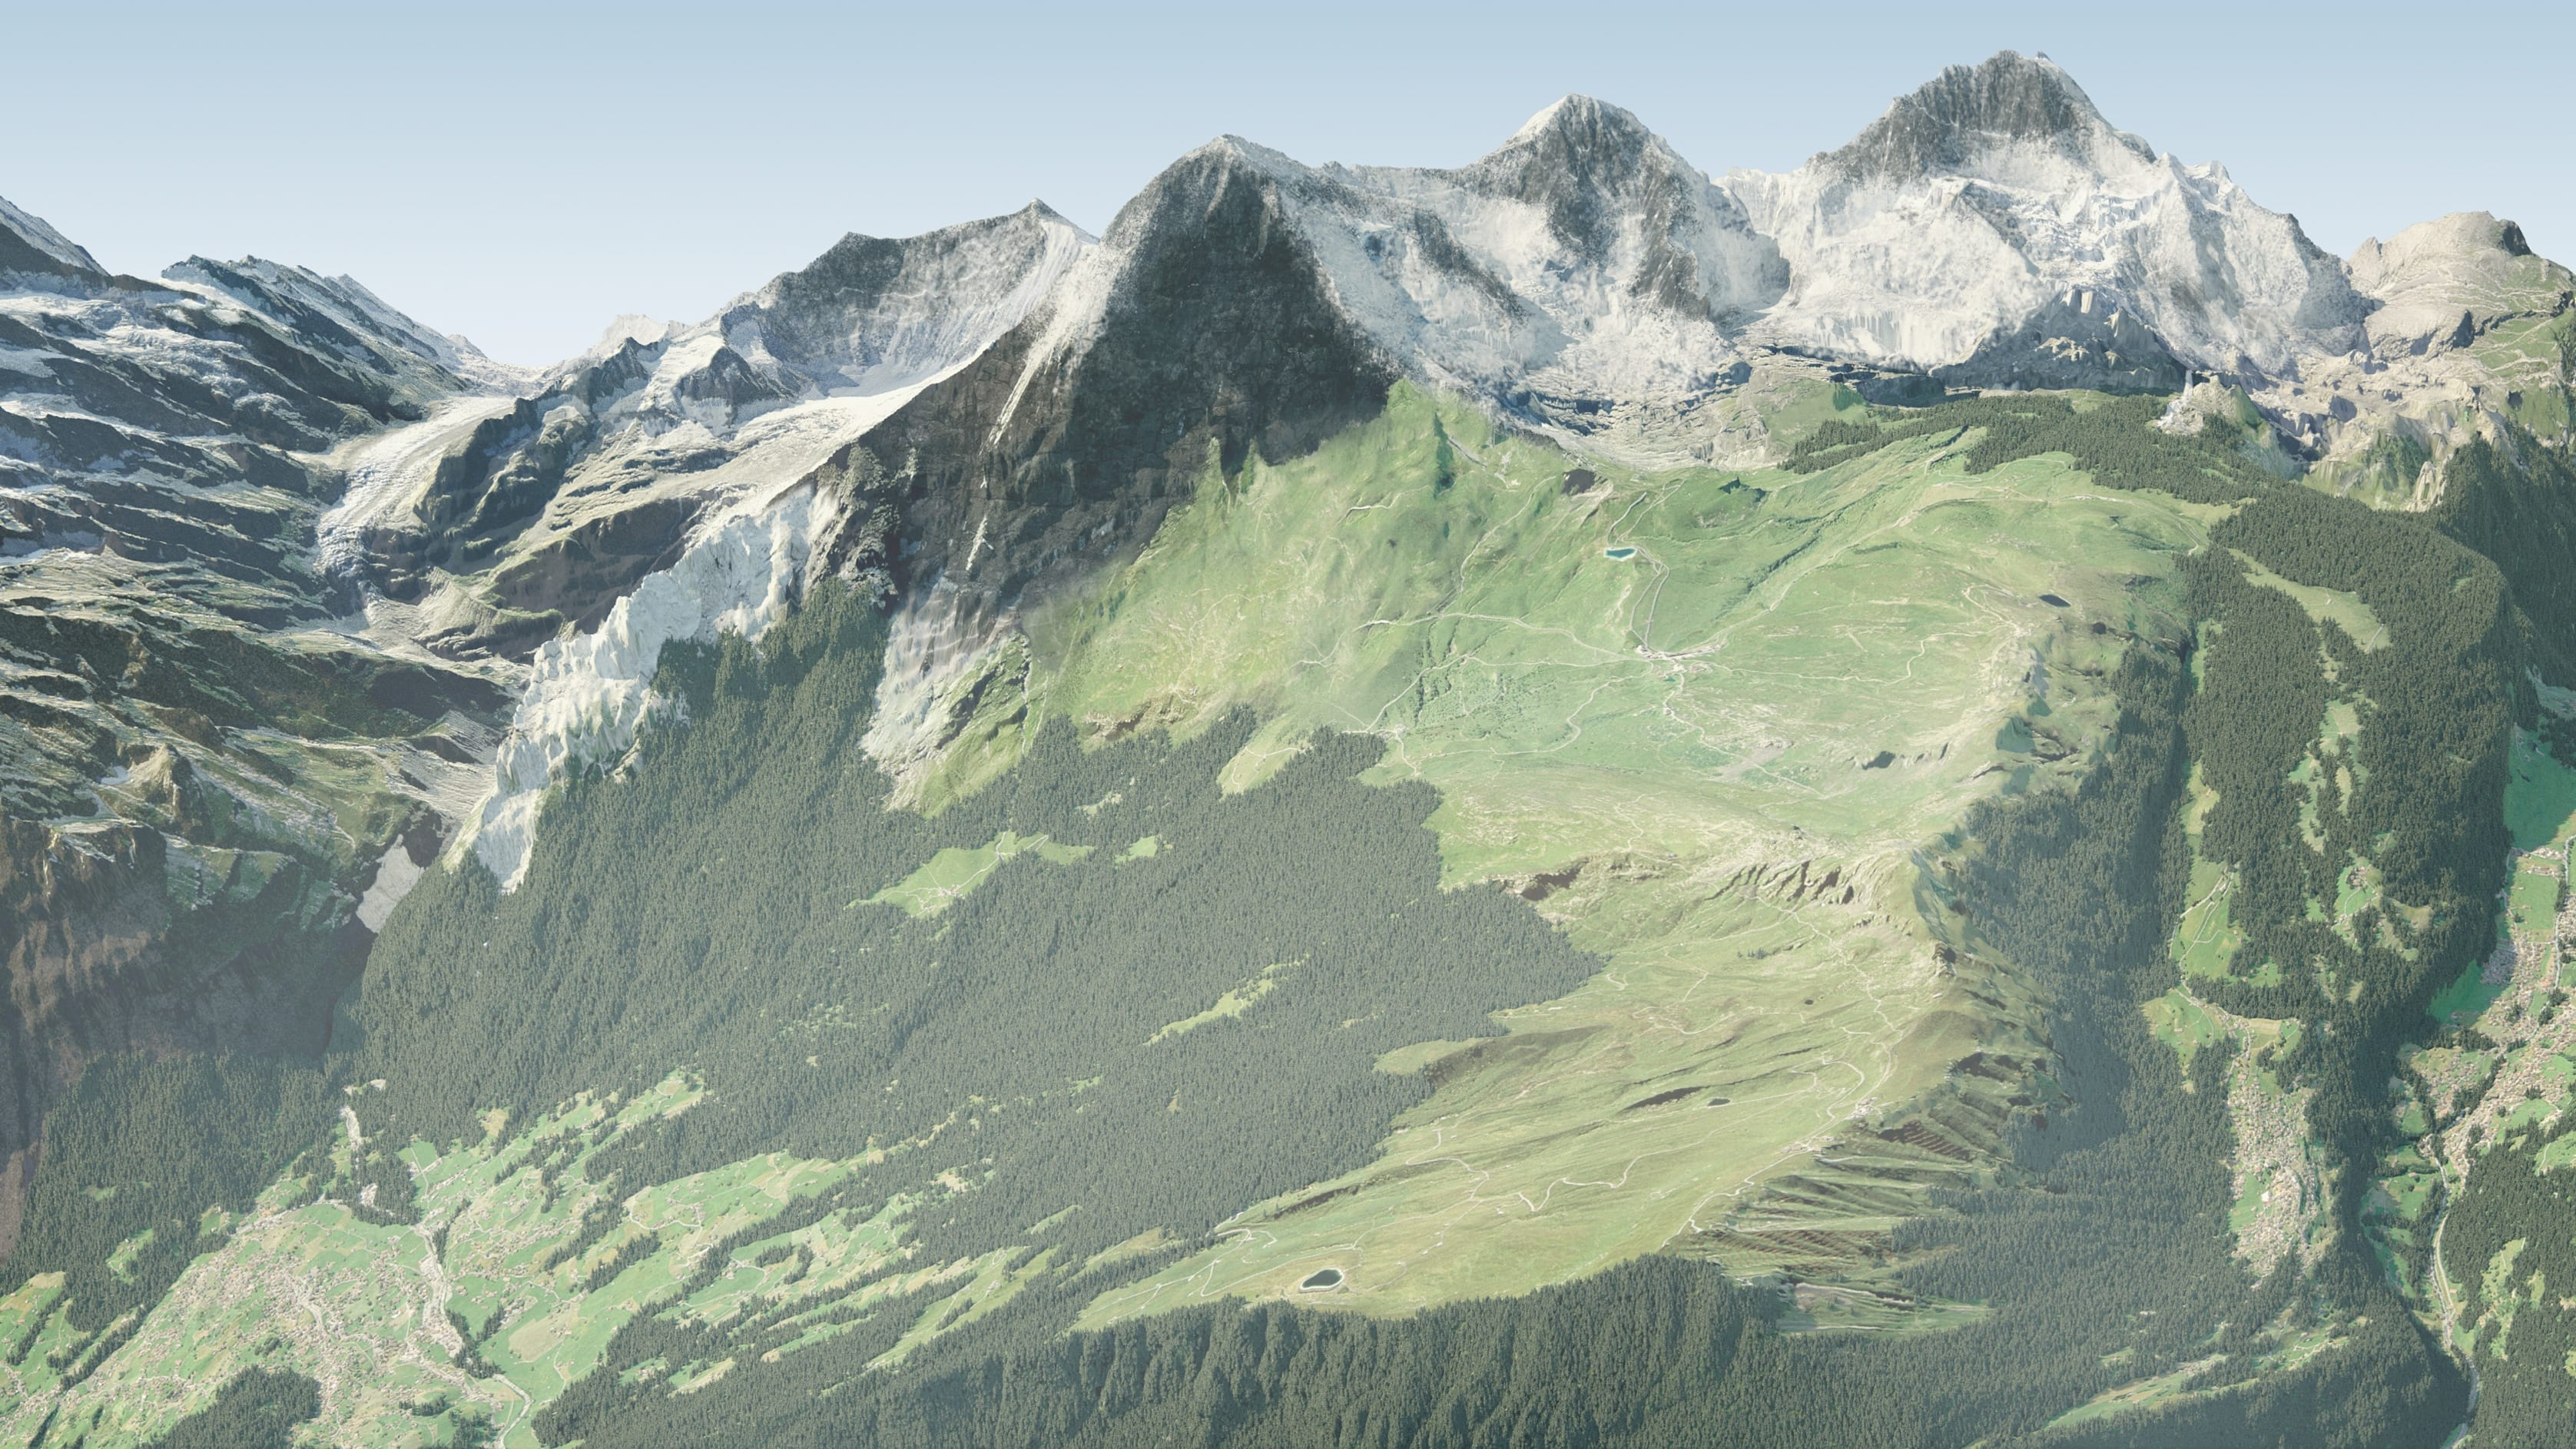 Grindelwald-Wengen (Summer)